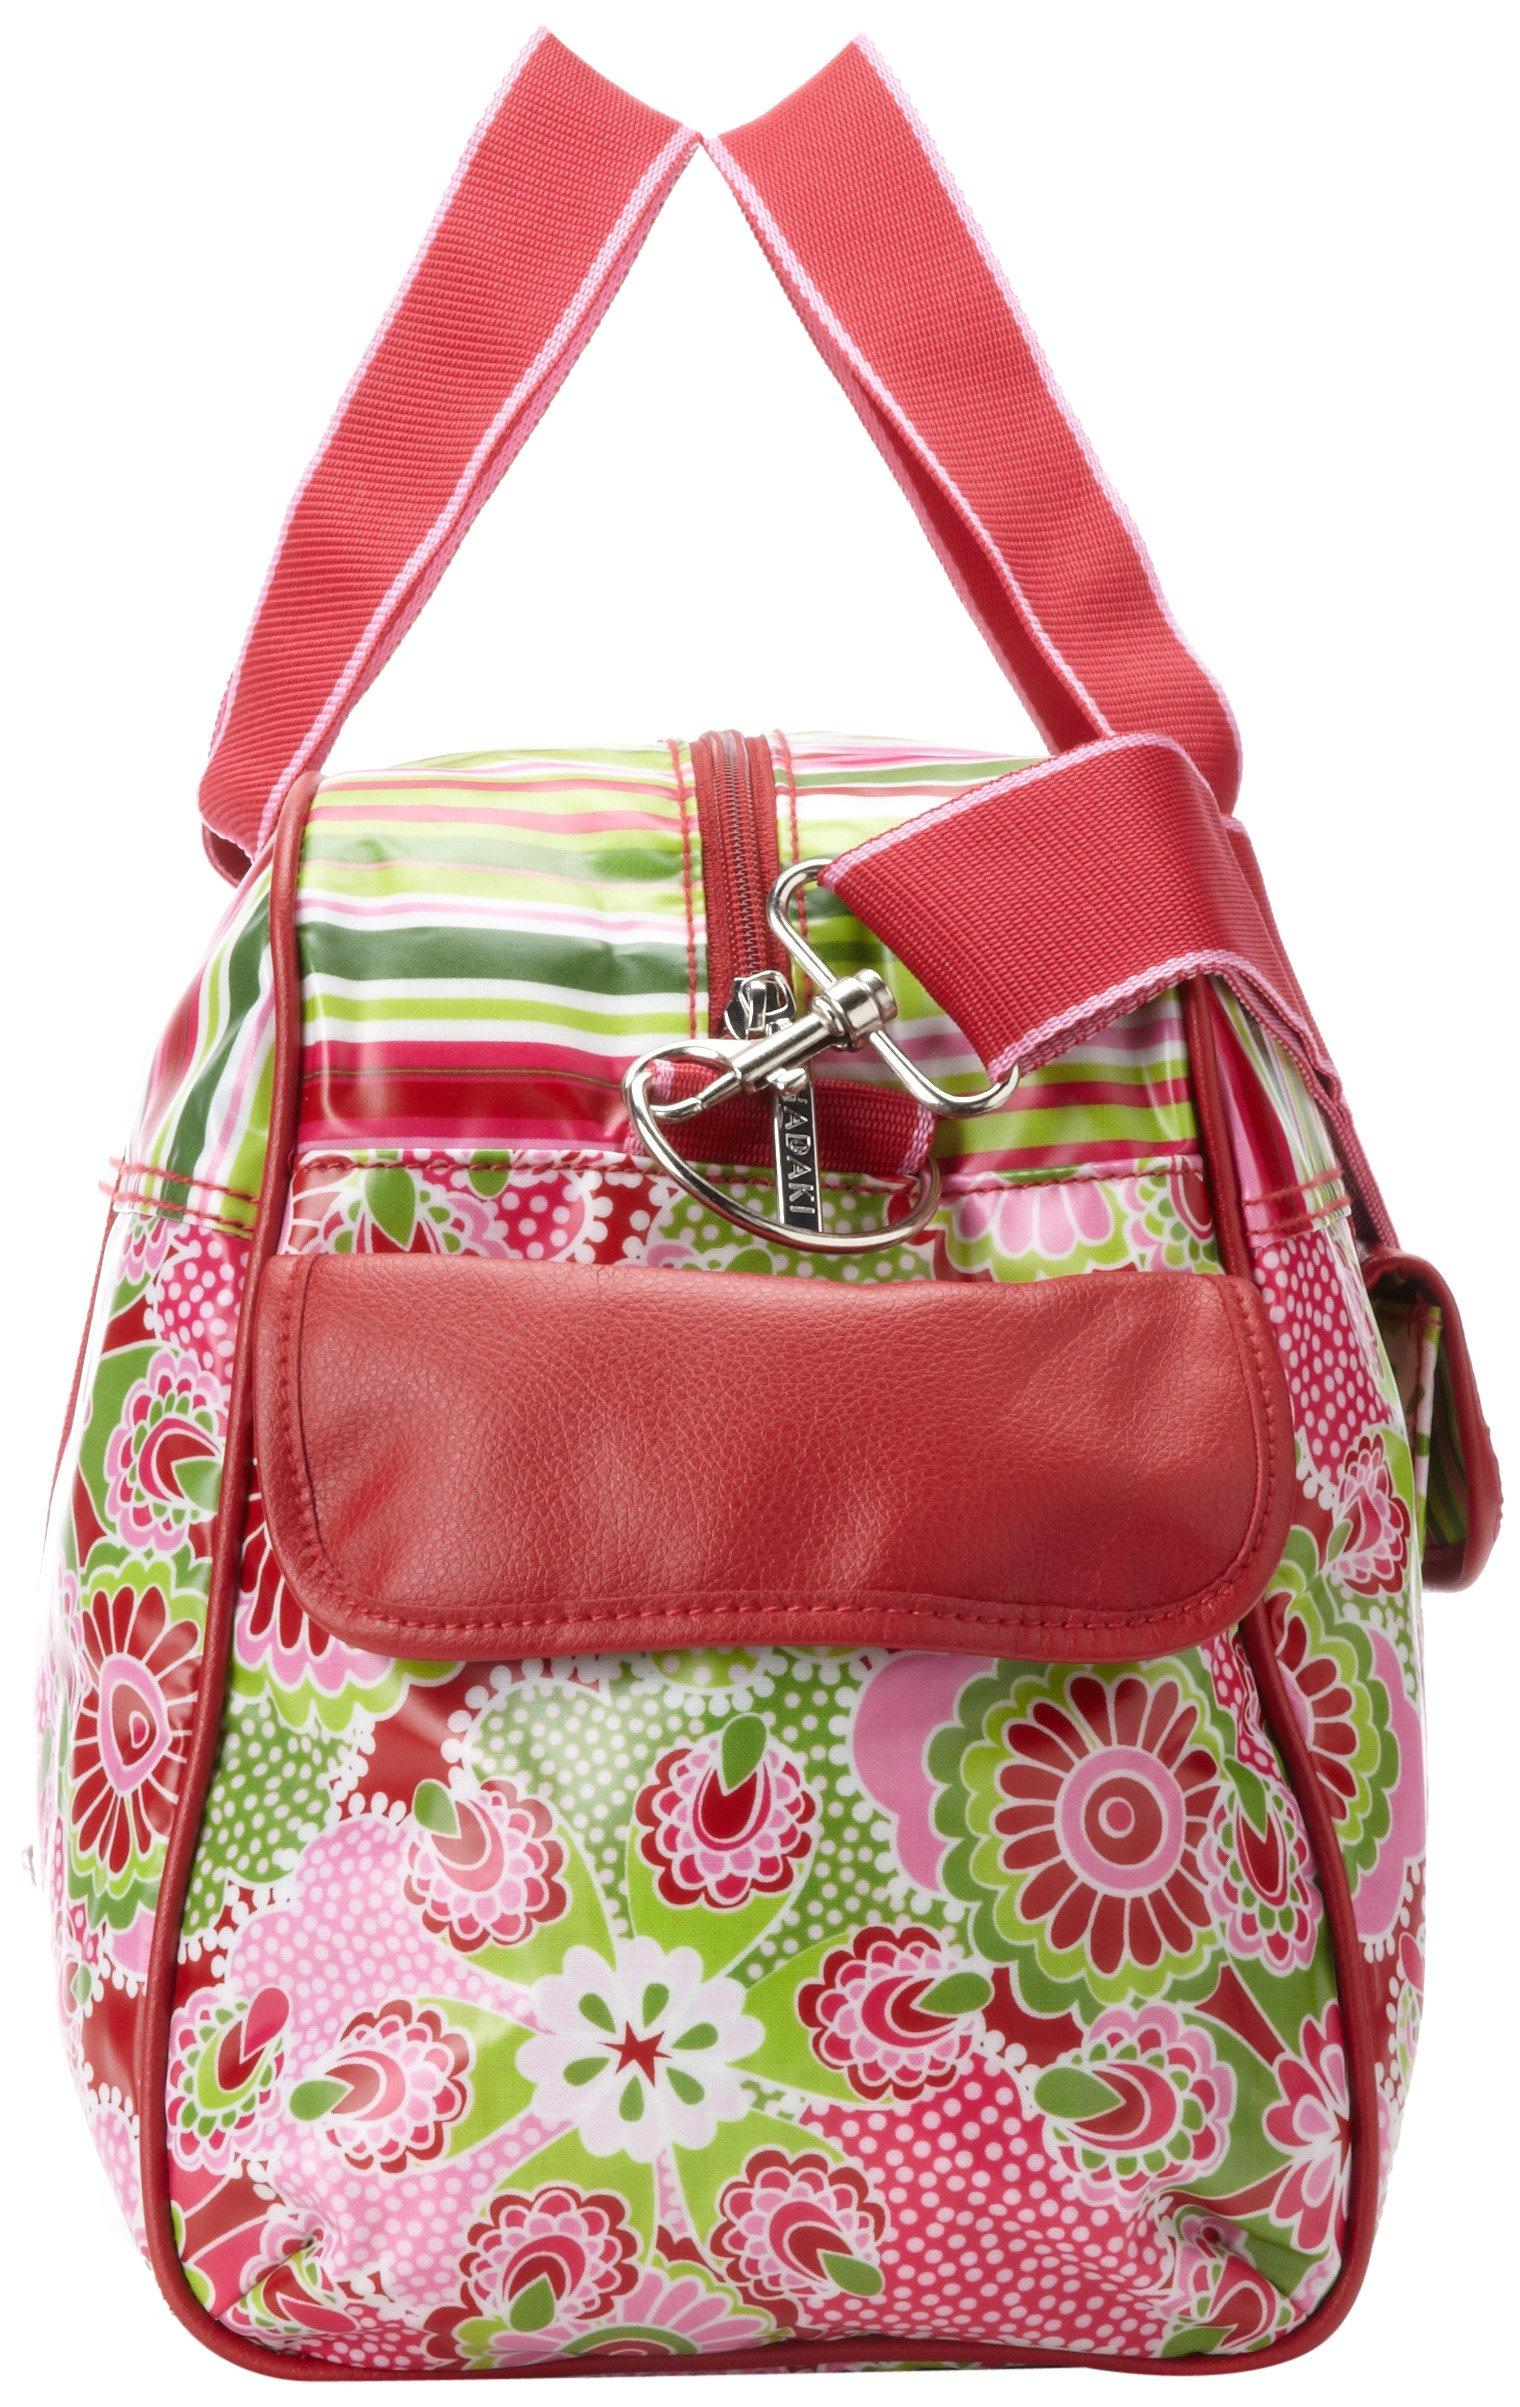 Hadaki Cool HDK826 Duffle Bag,Jazz Ruby,One Size by HADAKI (Image #4)